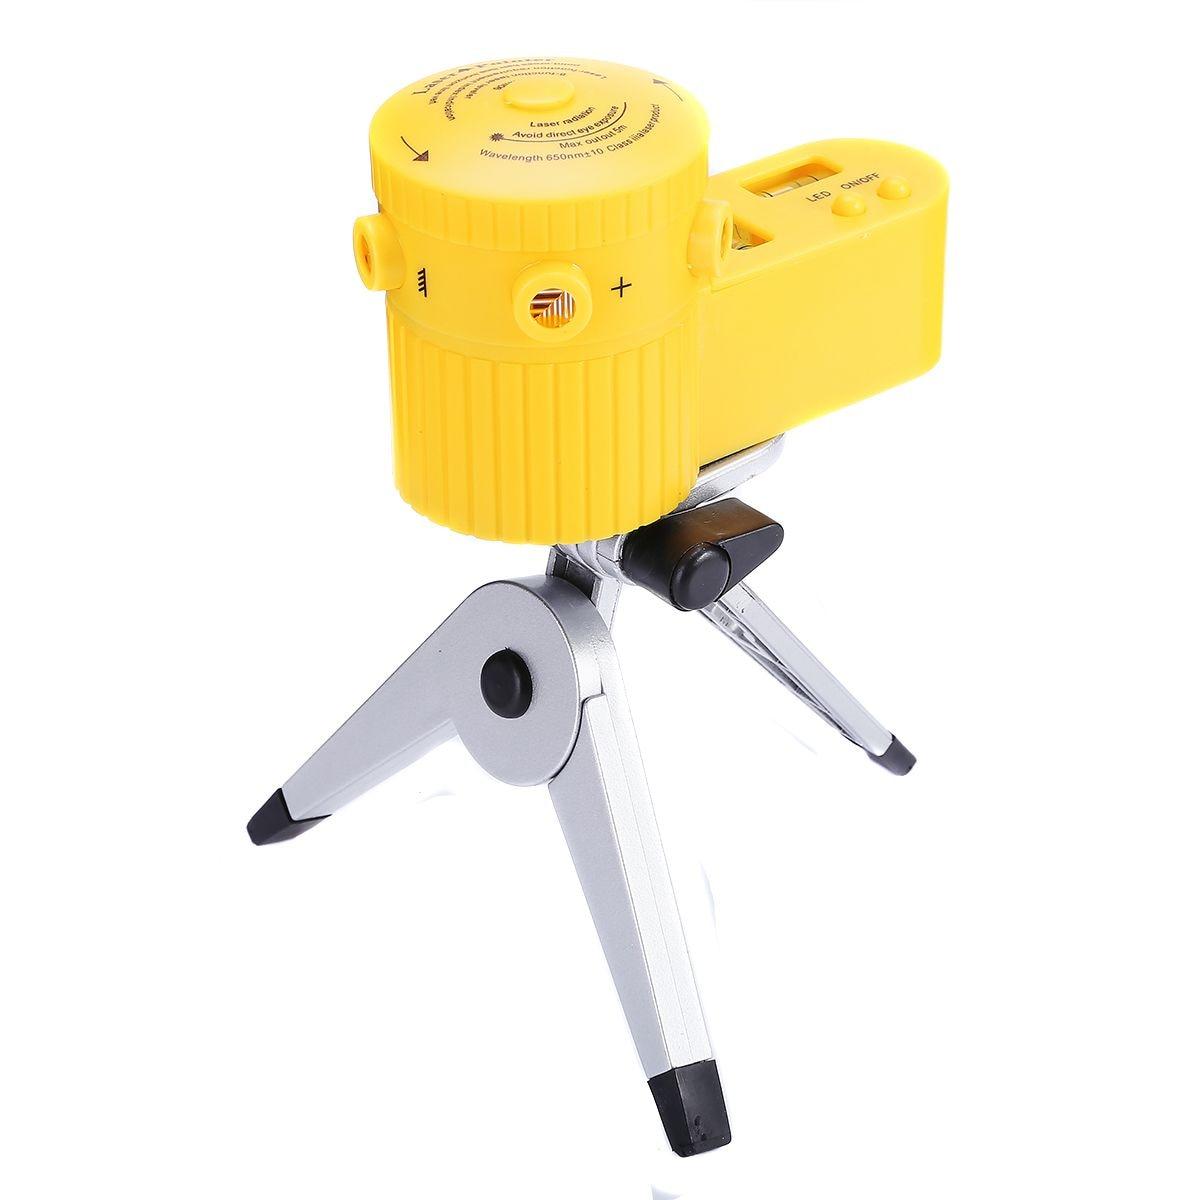 Multifunctional LED Laser Leveler Vertikal Horizontal Cross Line Tool Laser with Tripod